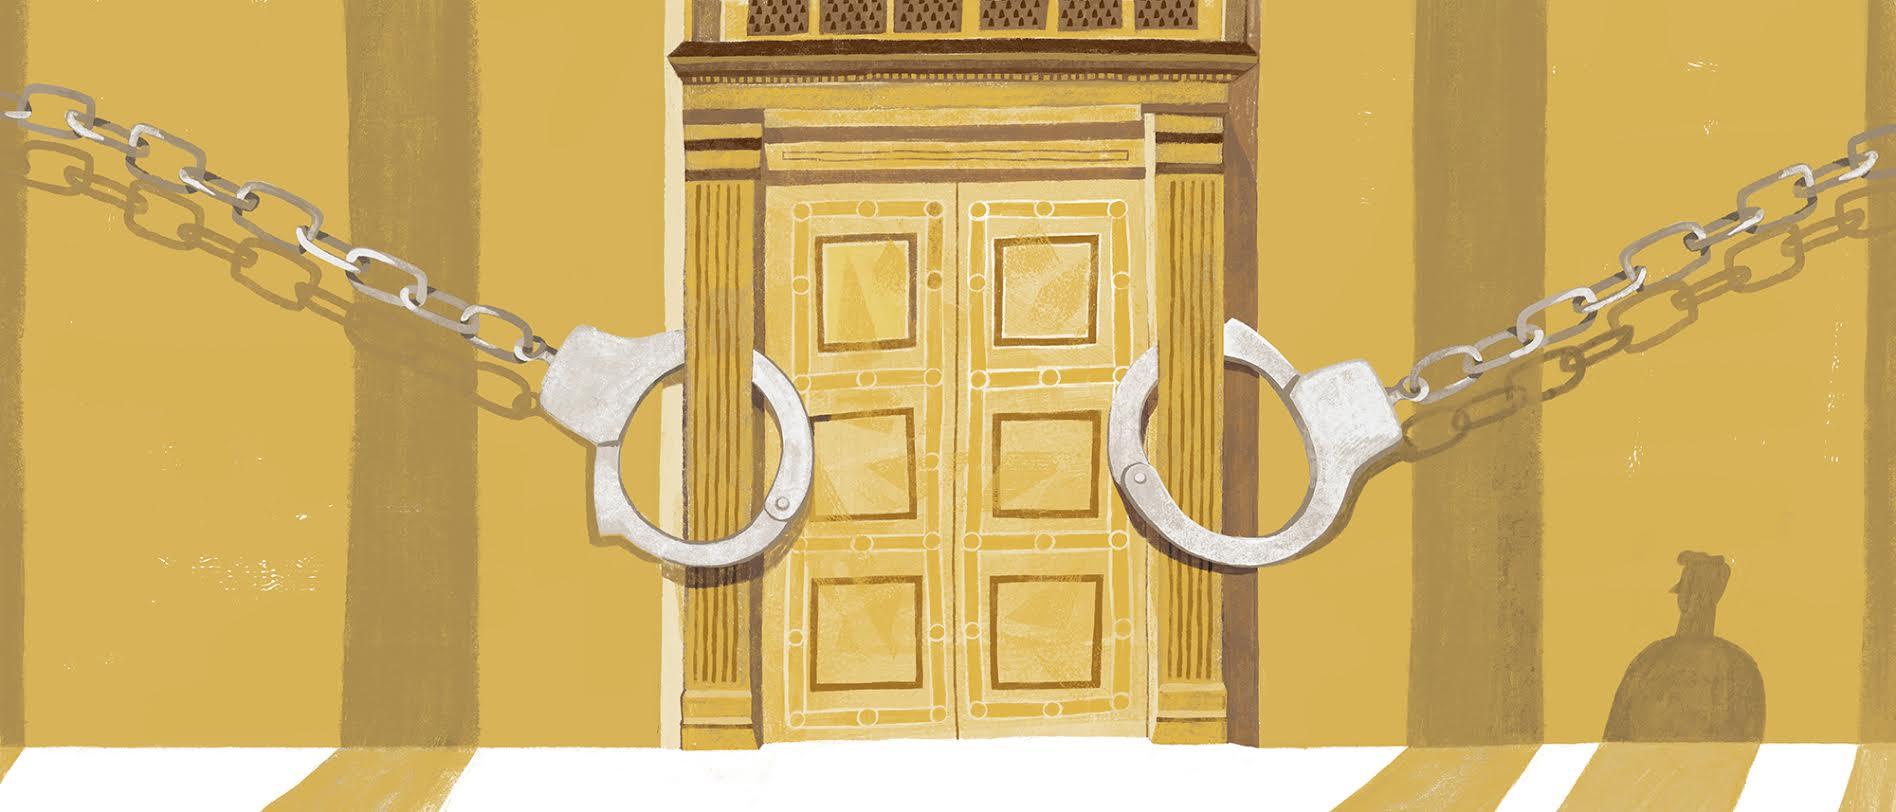 Chains on Court Doors.jpg